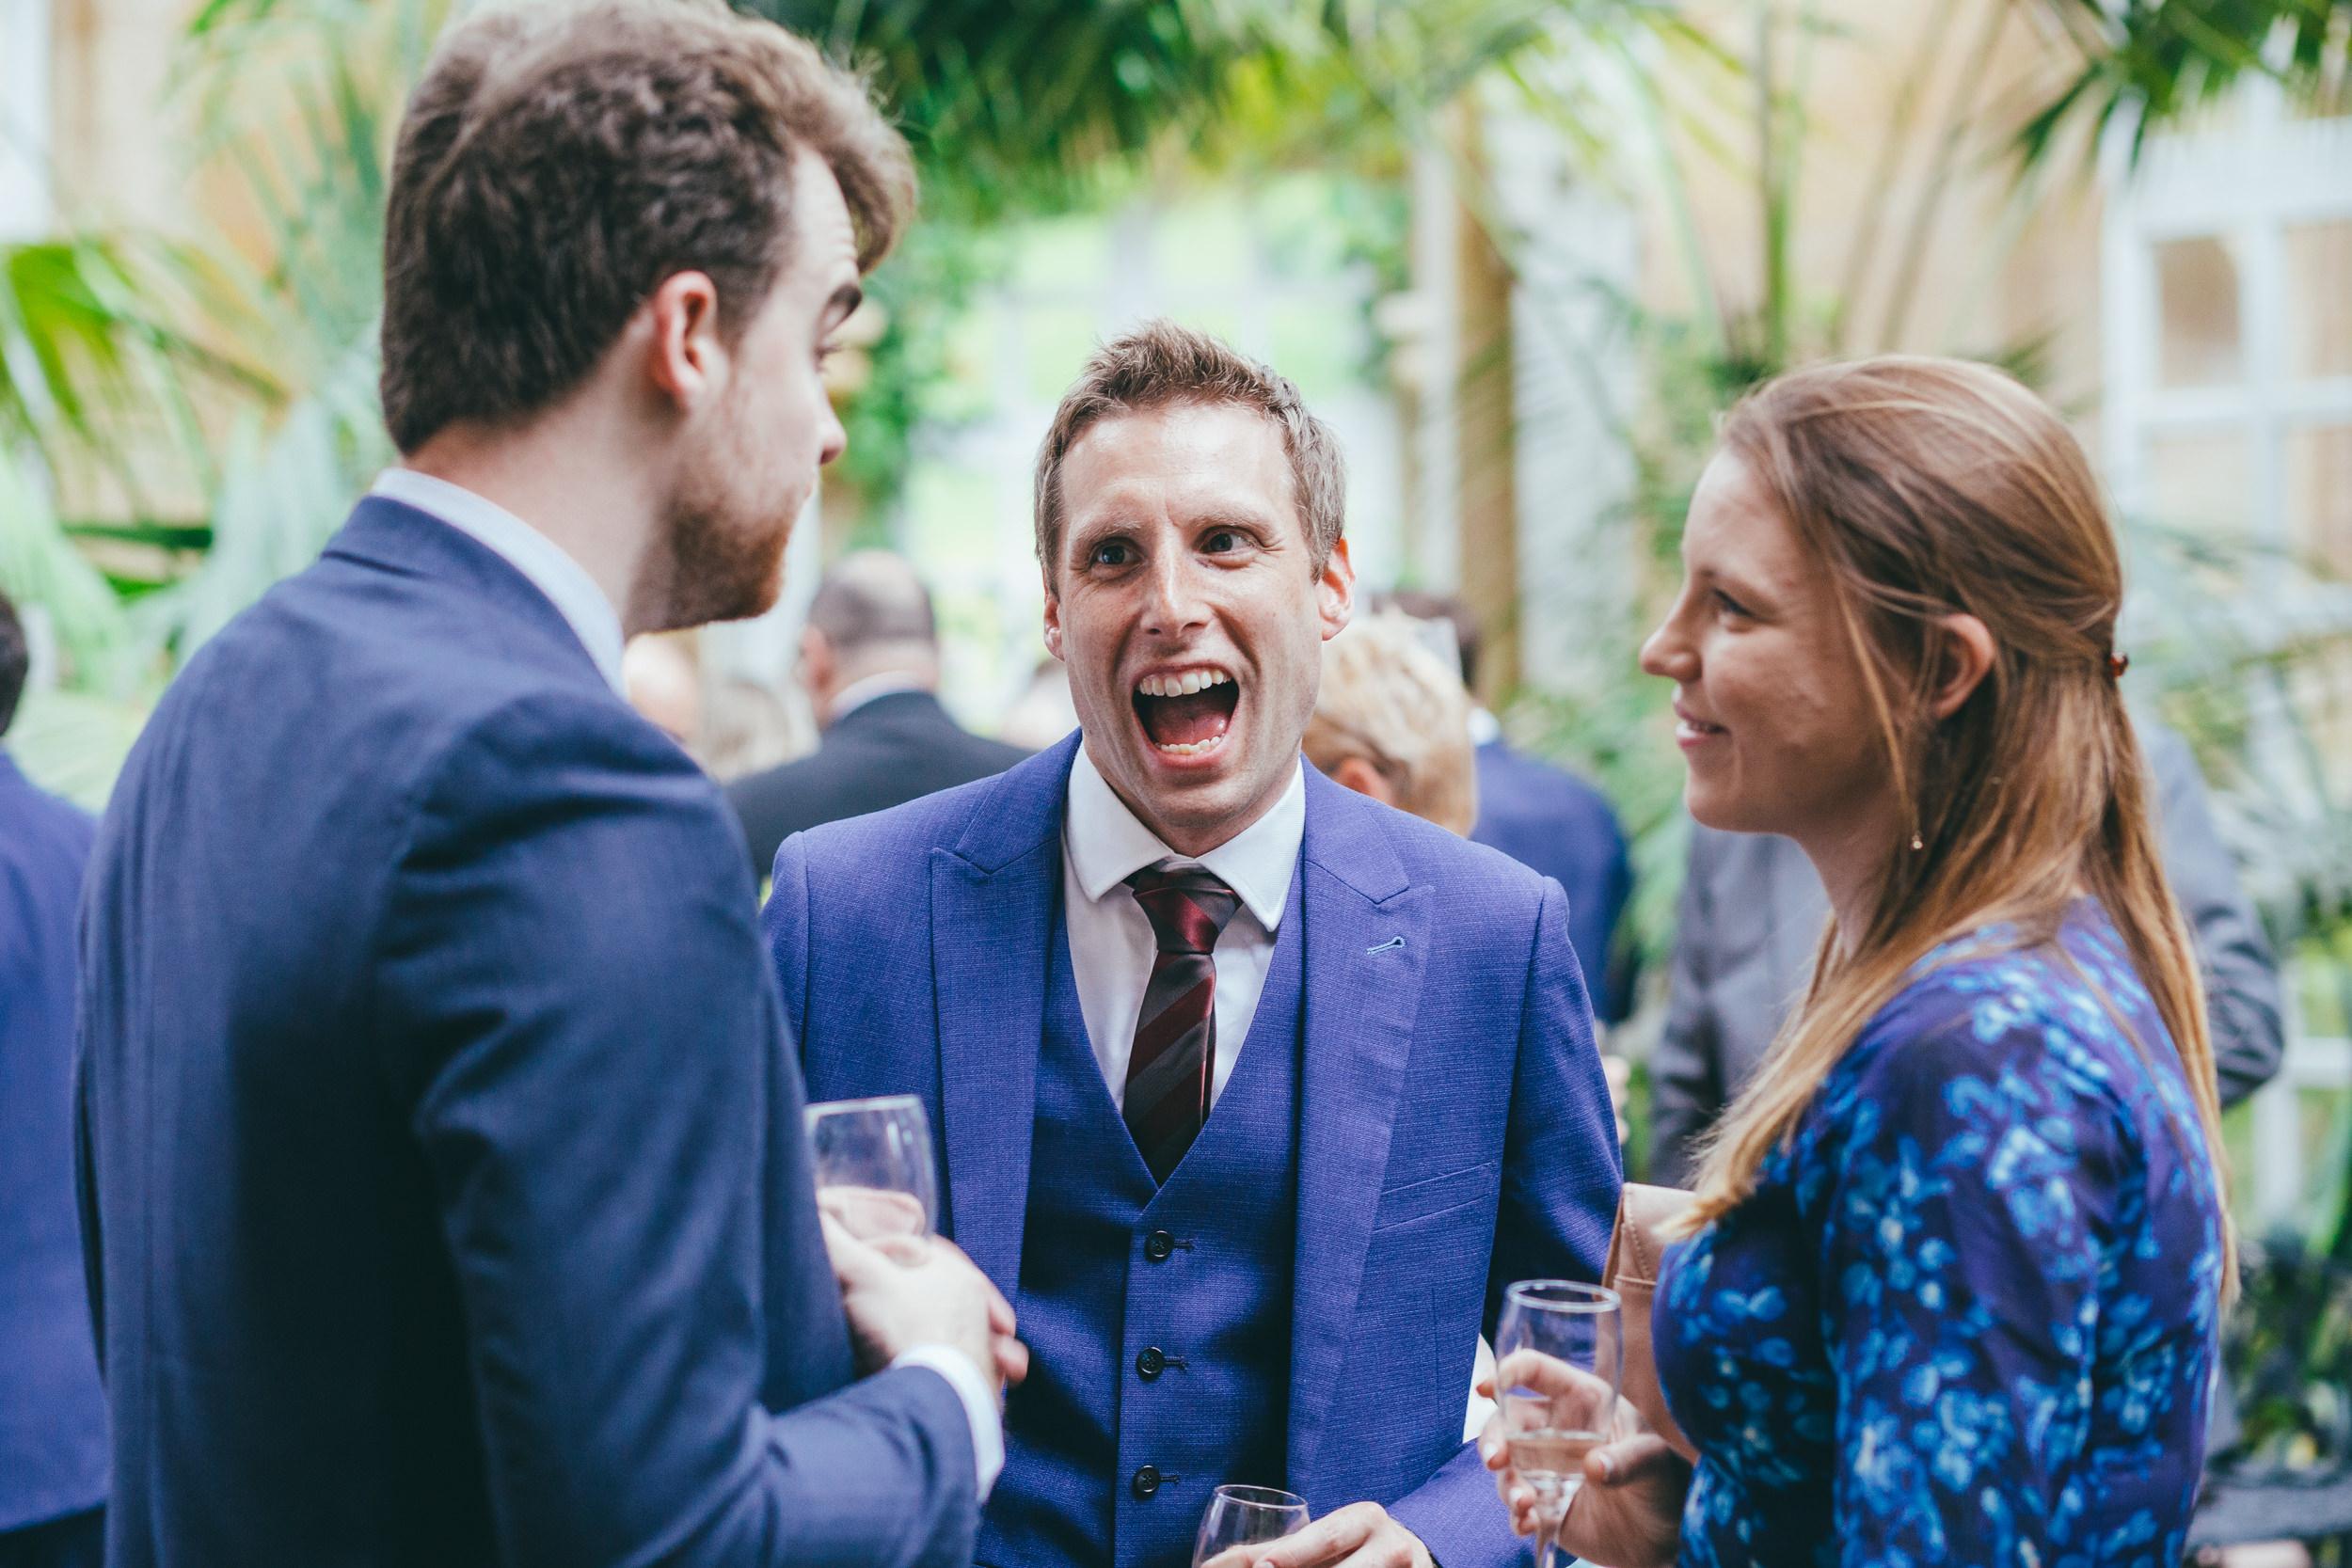 Guys sharing a joke at Harlaxton Manor